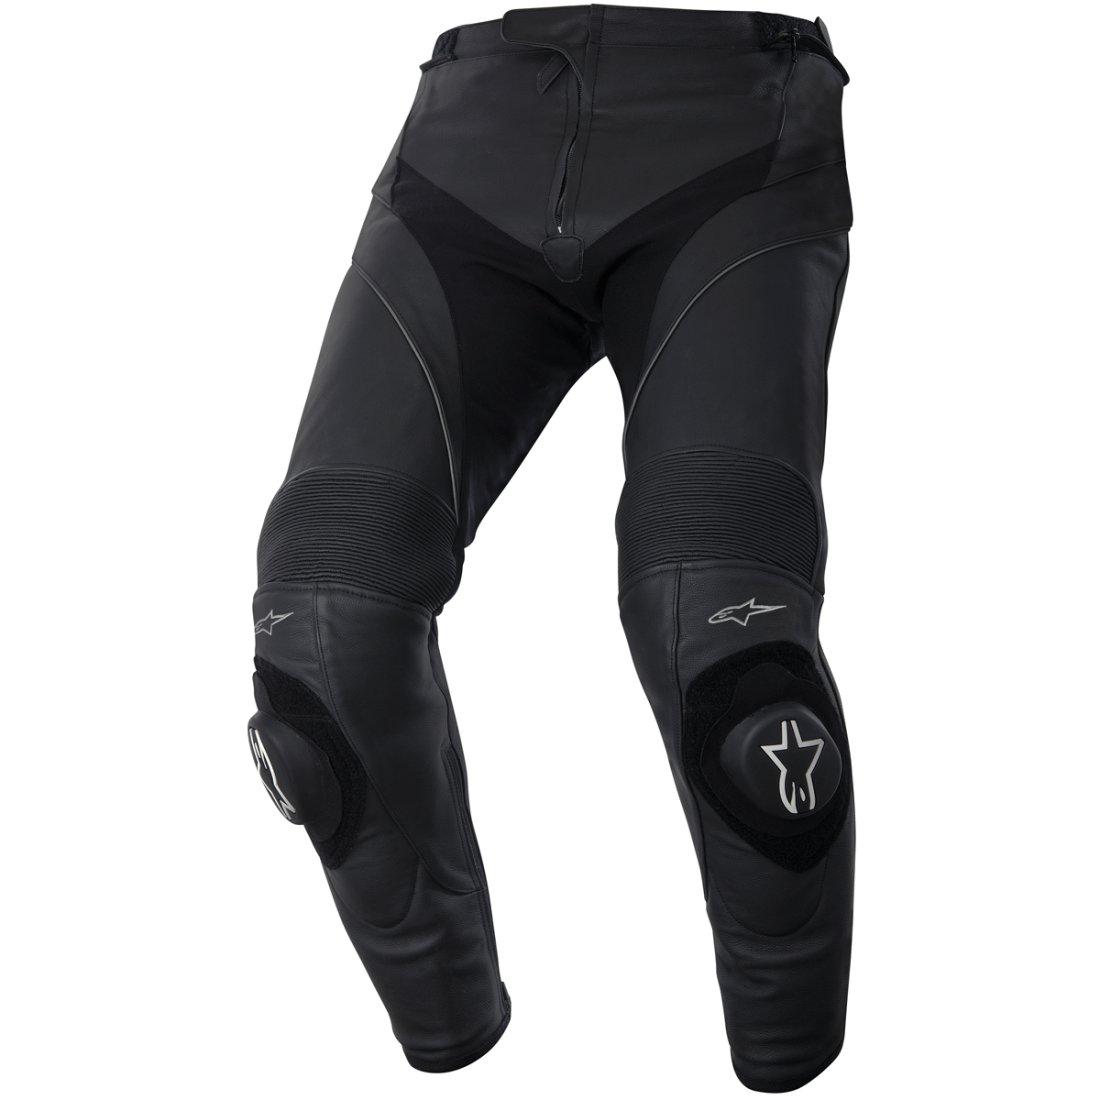 9699683242a 93 Pantalones para moto de carretera ALPINESTARS · Motocard